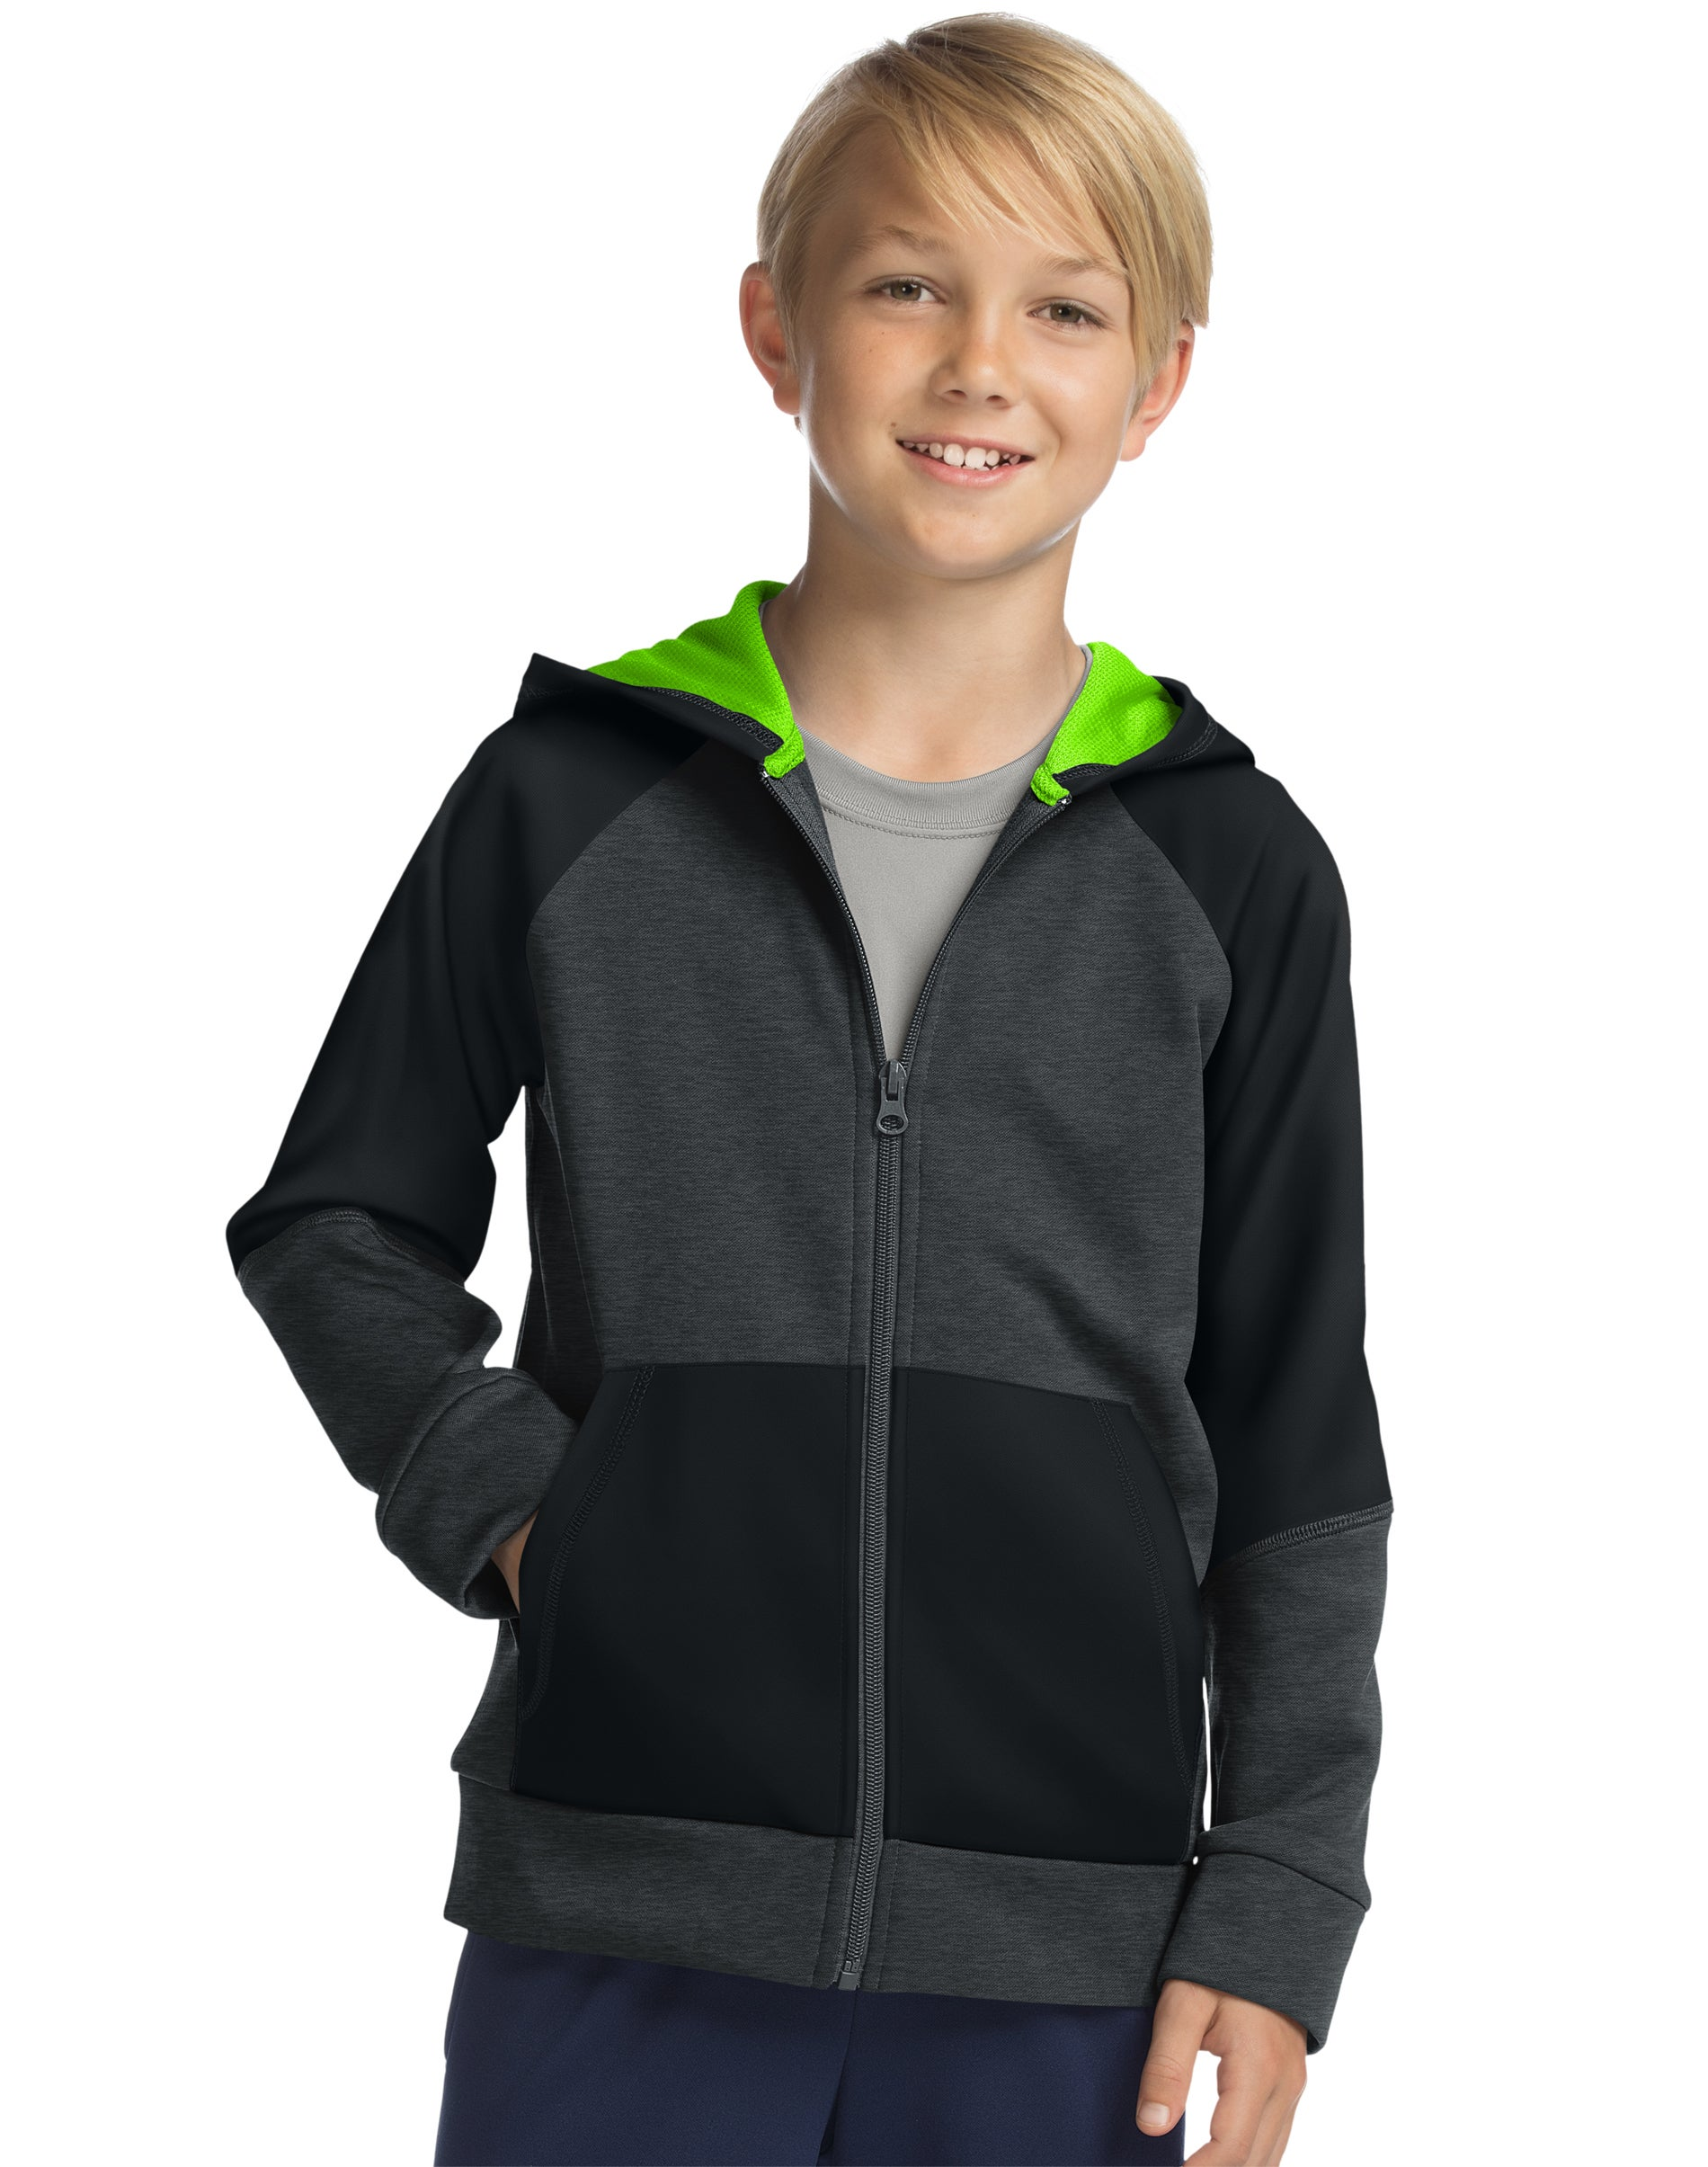 NEW Boys Tech Fleece Zip Hooded Jacket by Everlast  New w// tag $44